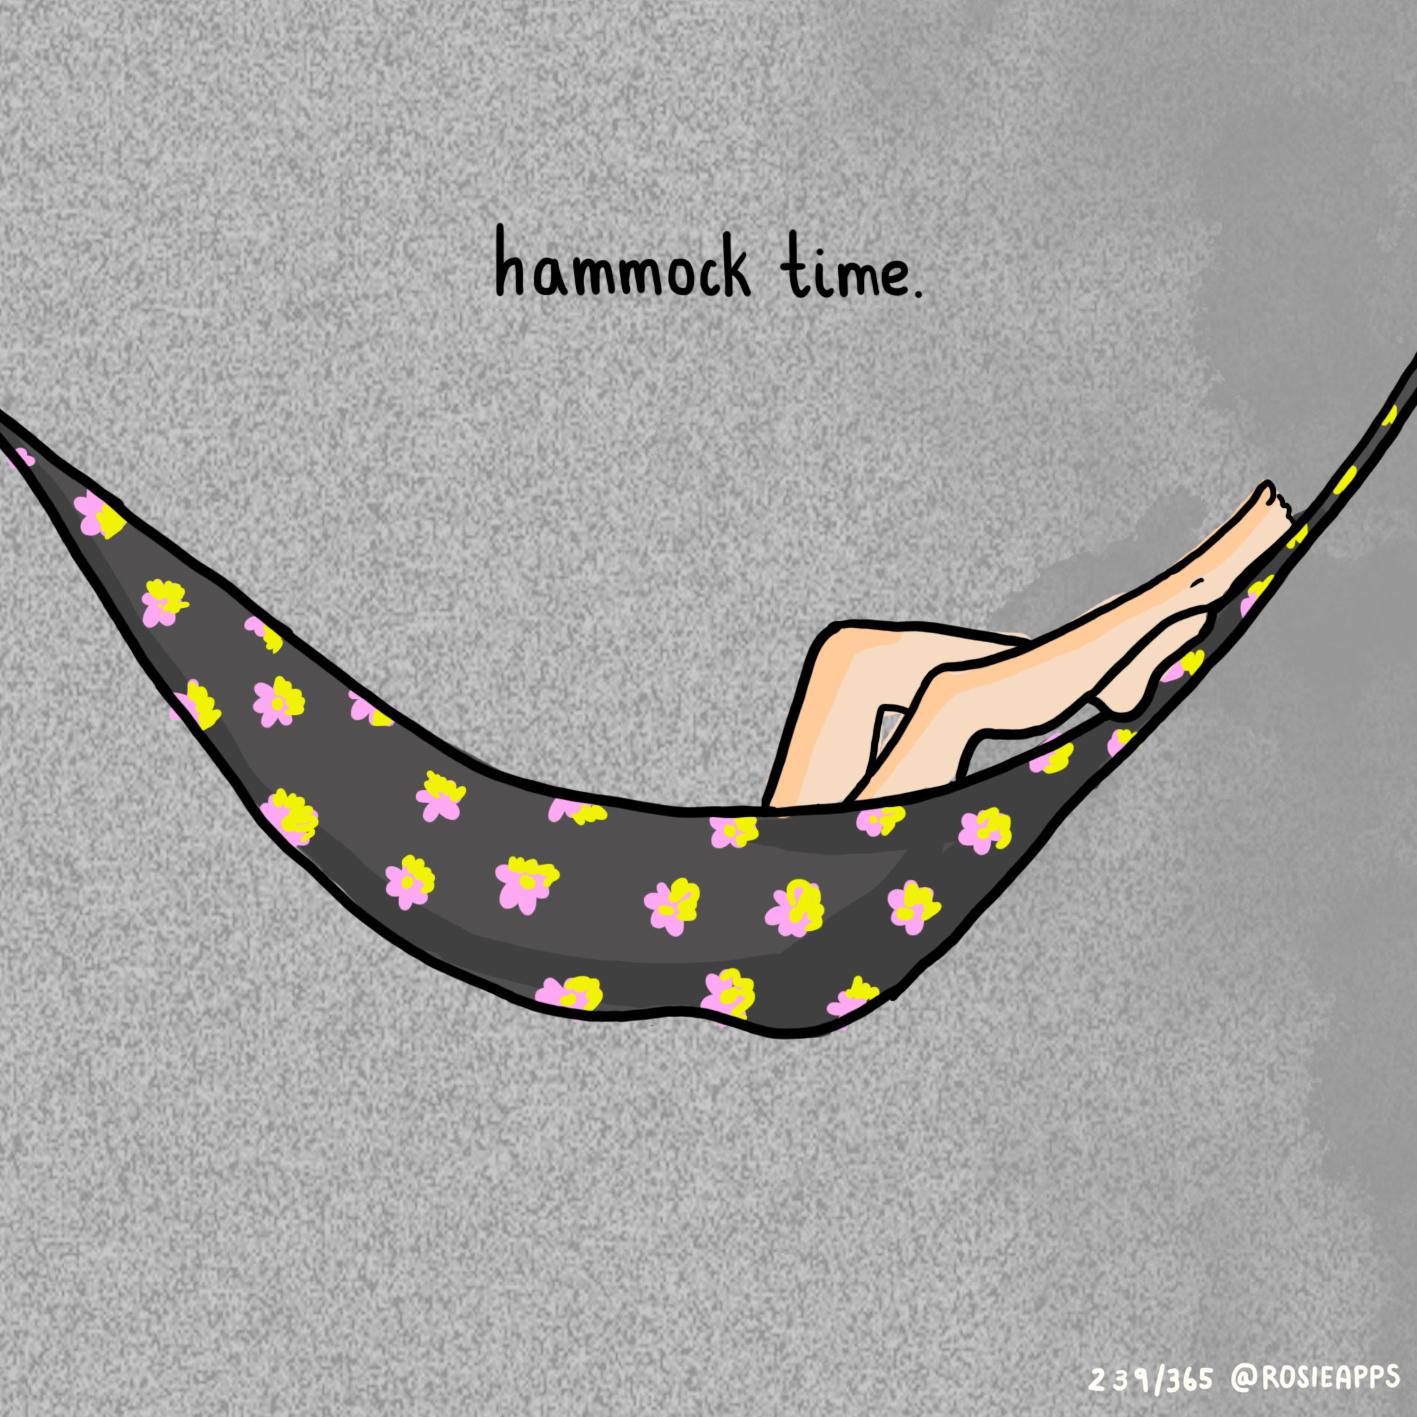 August-239-365 hammock.jpg